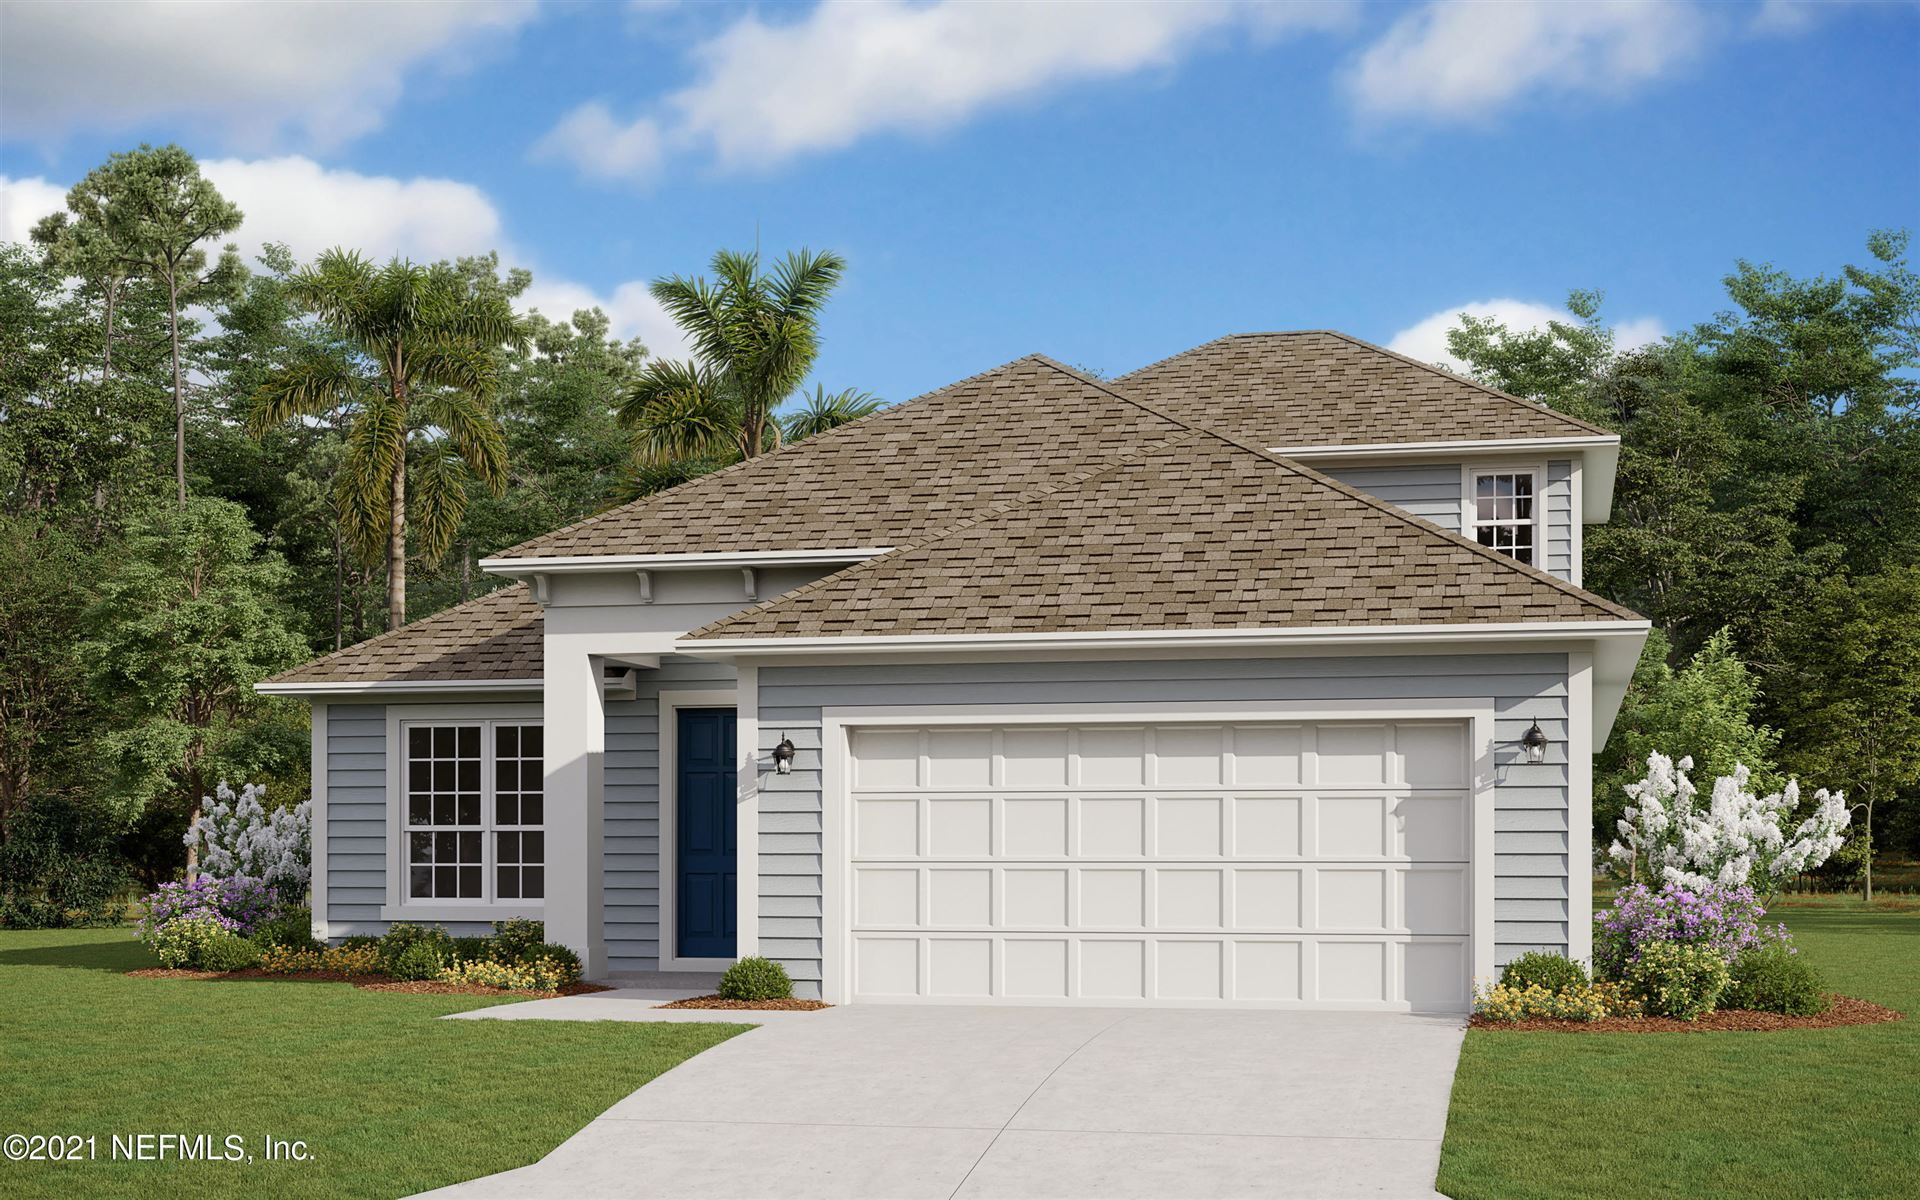 2846 COPPERWOOD AVE #Lot No: 046, Orange Park, FL 32073 - MLS#: 1119177